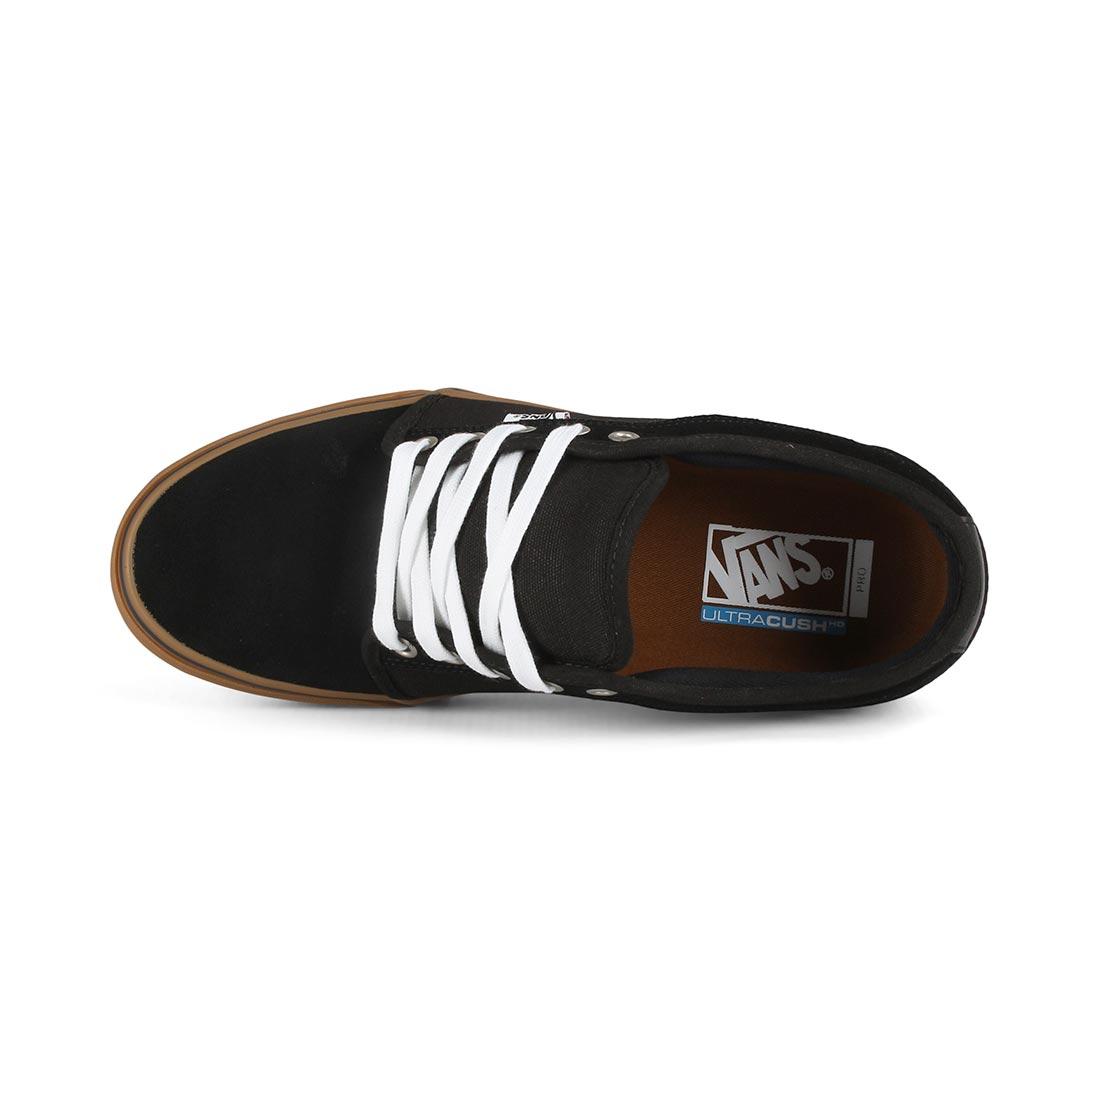 Vans Chukka Low Pro Skate Shoes - Black   Black   Gum 17b17ccc0